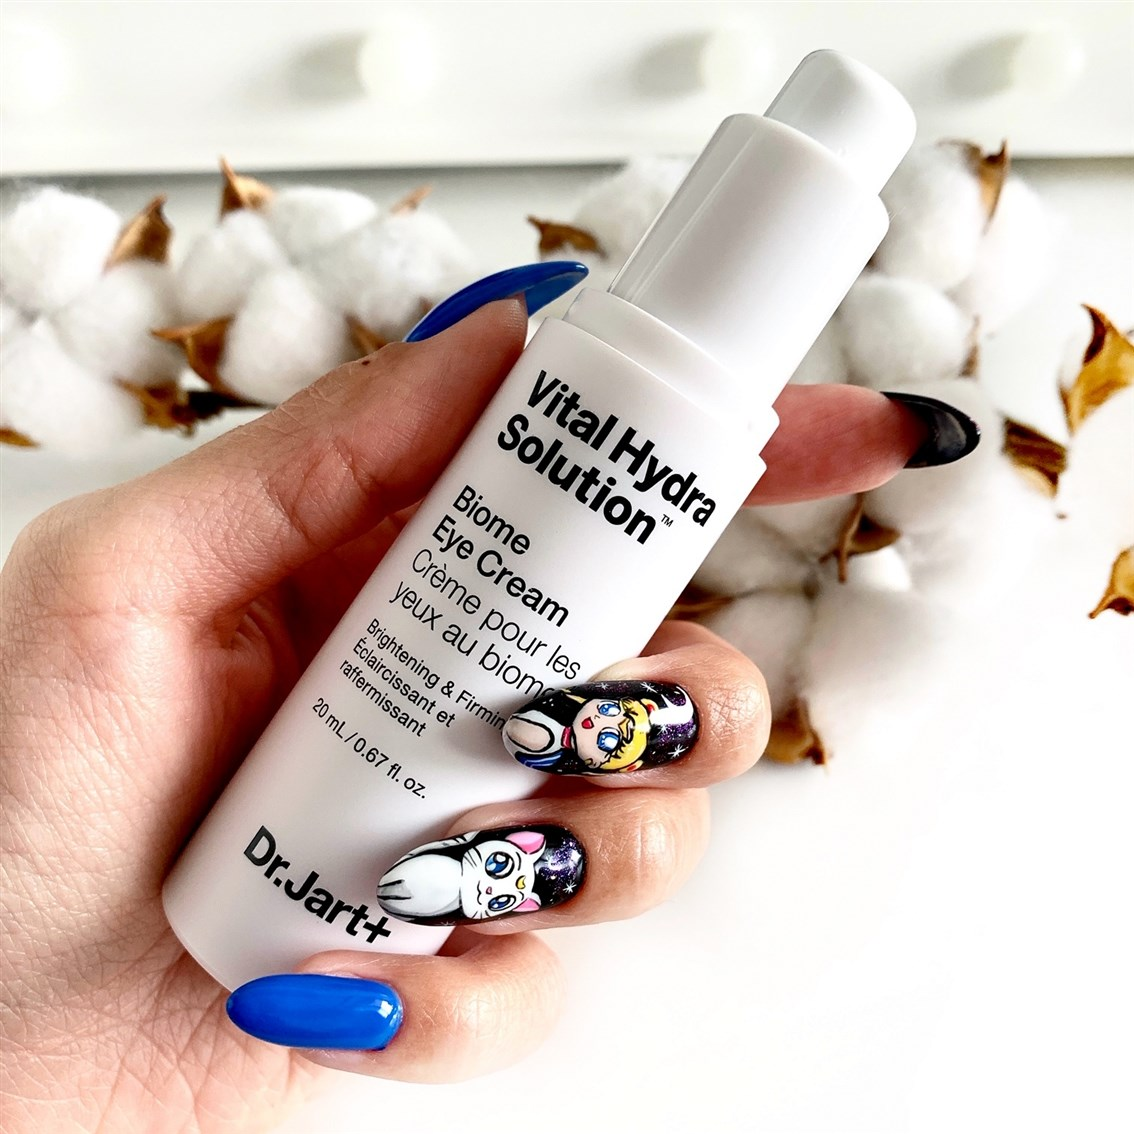 Dr. Jart+ Vital Hydra Solution Biome Eye Cream blog